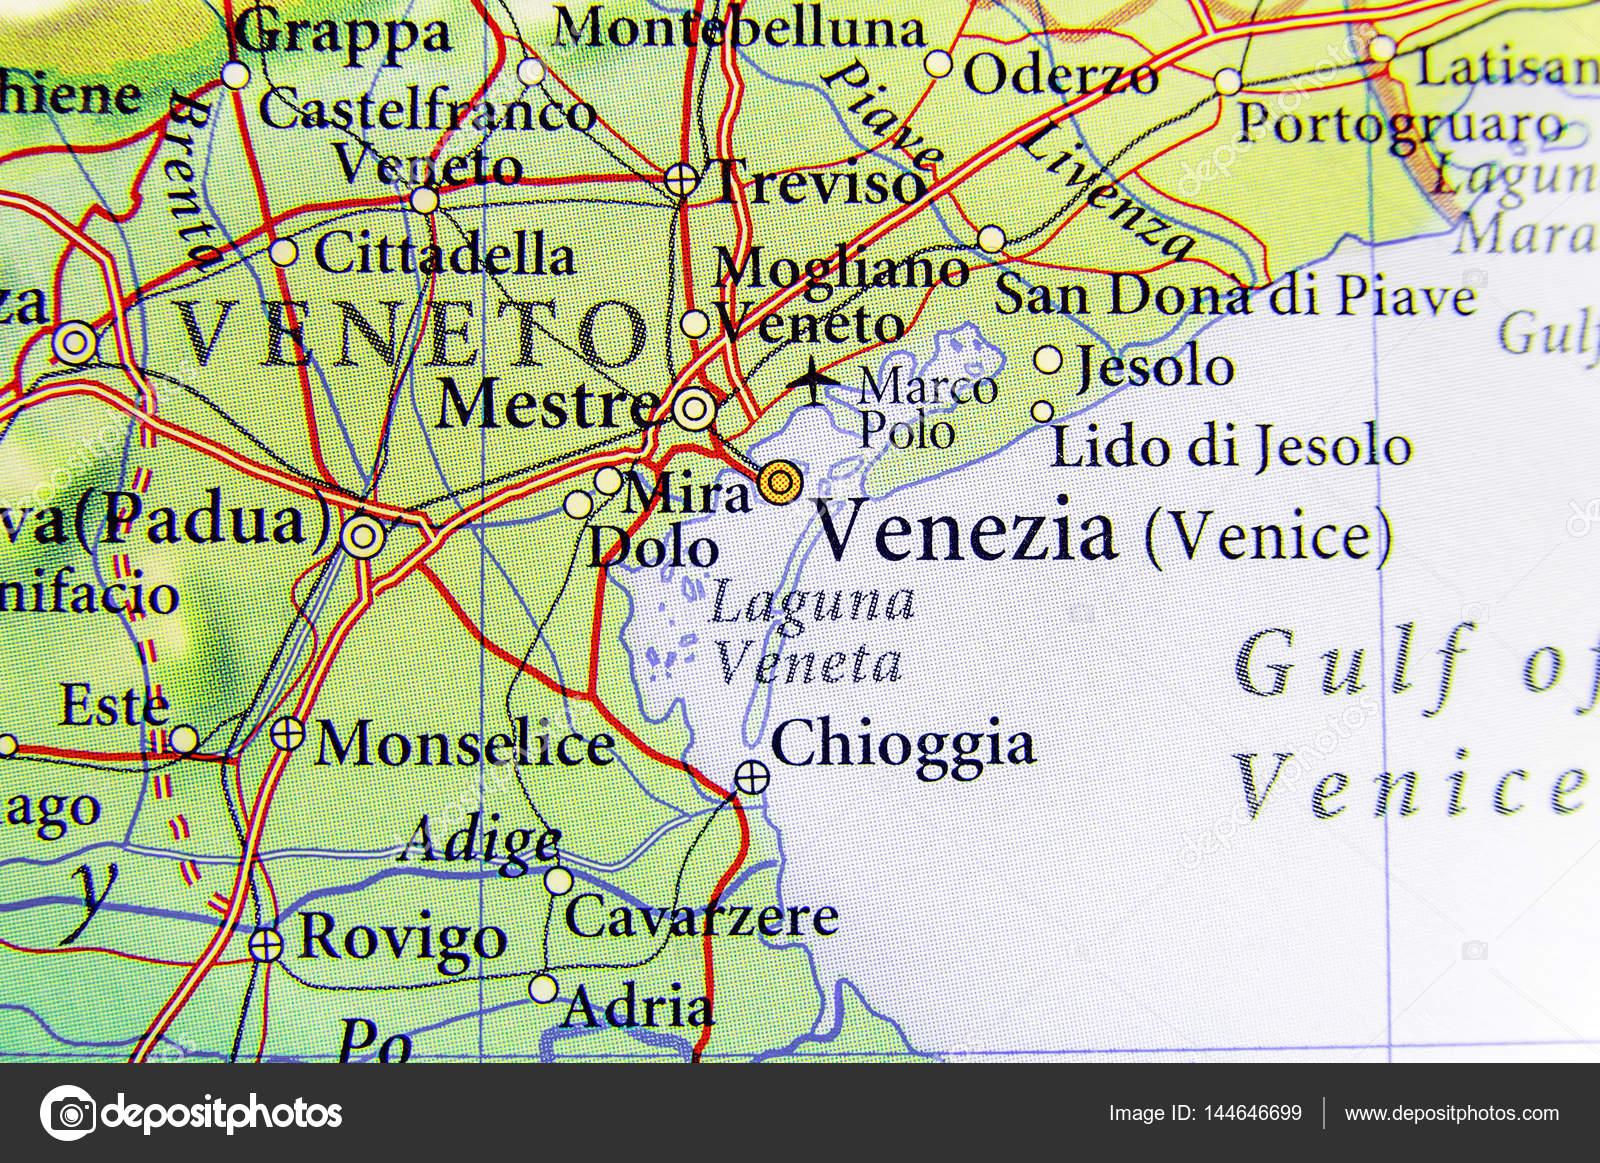 Cartina Venezia Lido.Geographic Map Of European Country Italy With Venezia City